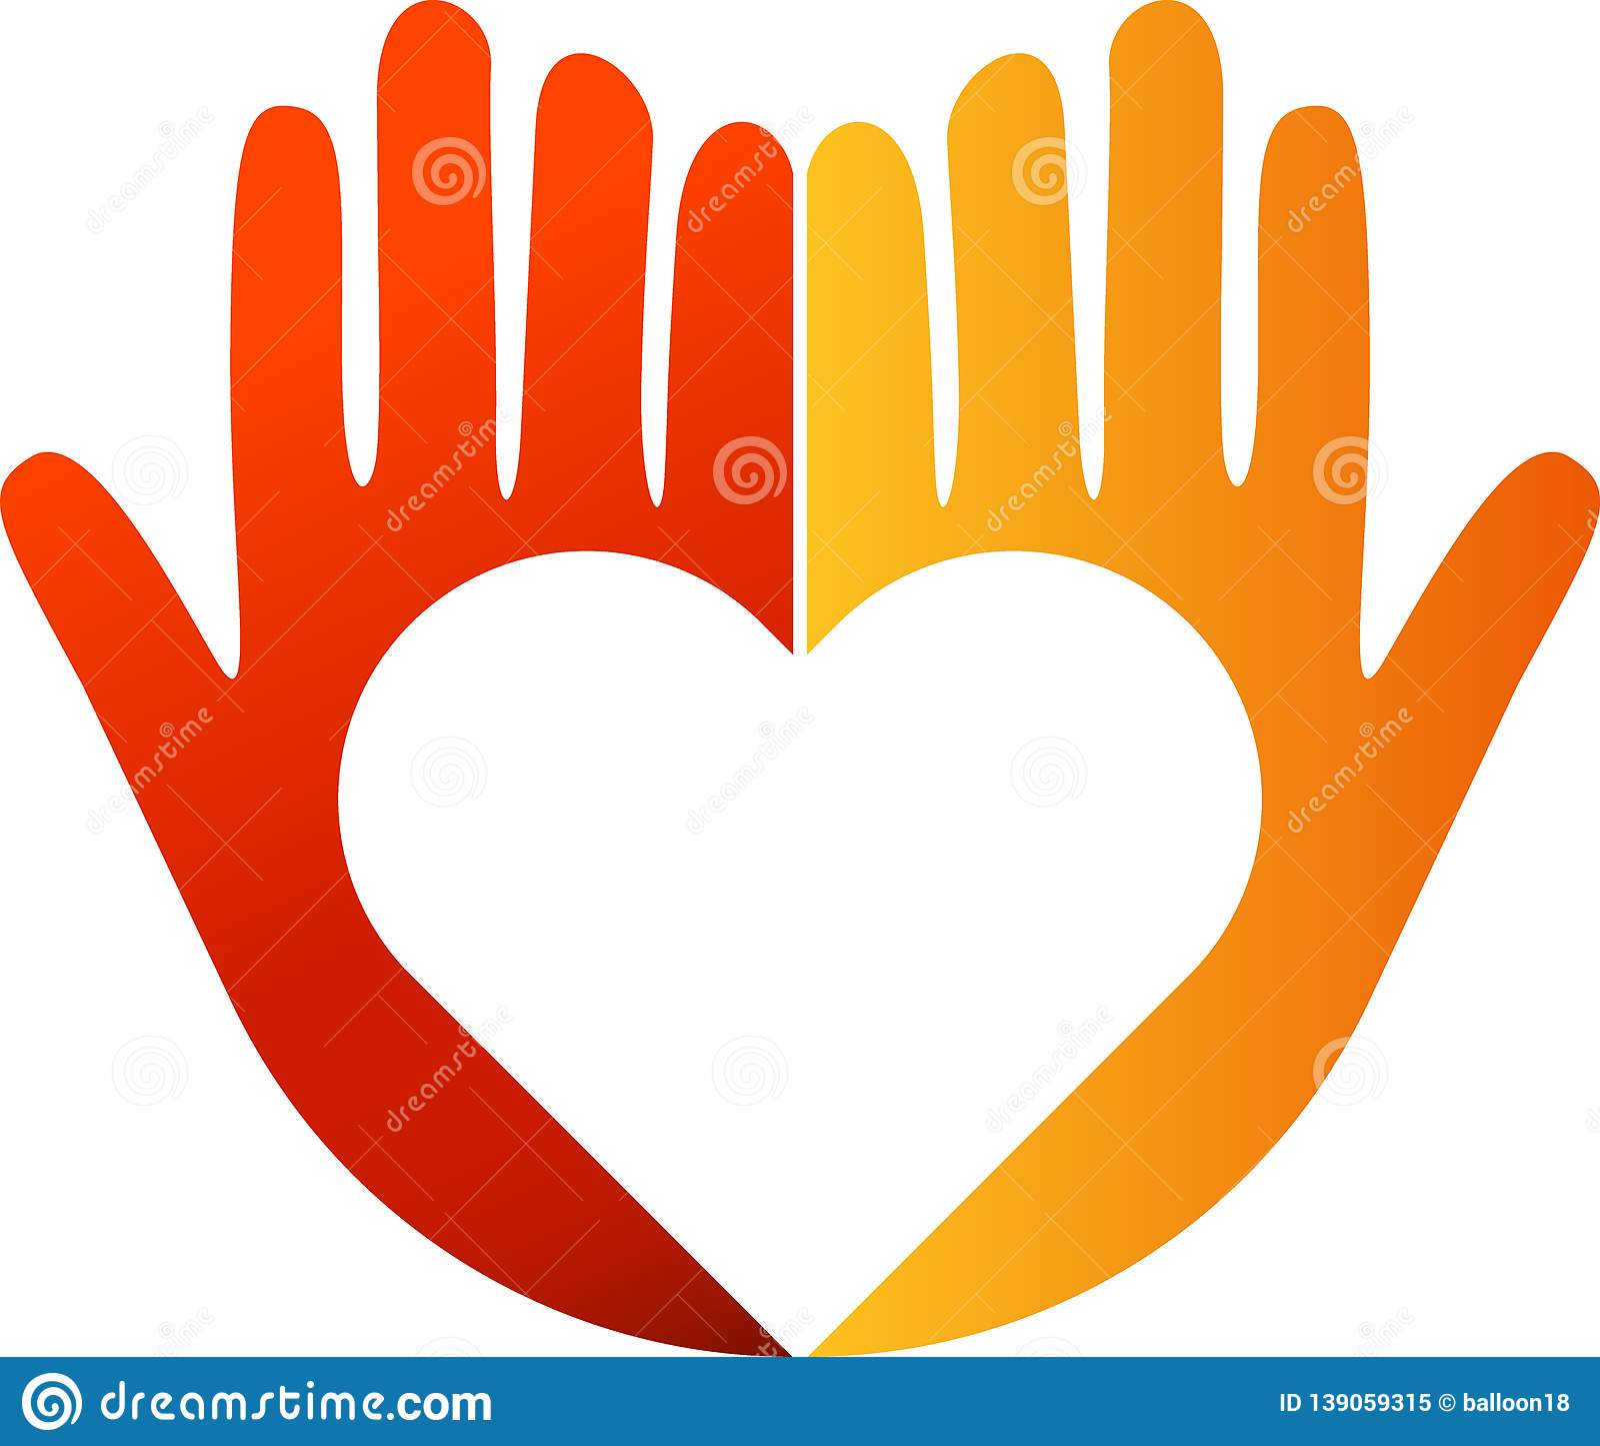 Heart In Hands Logo Stock Vector. Illustration Of Emblem